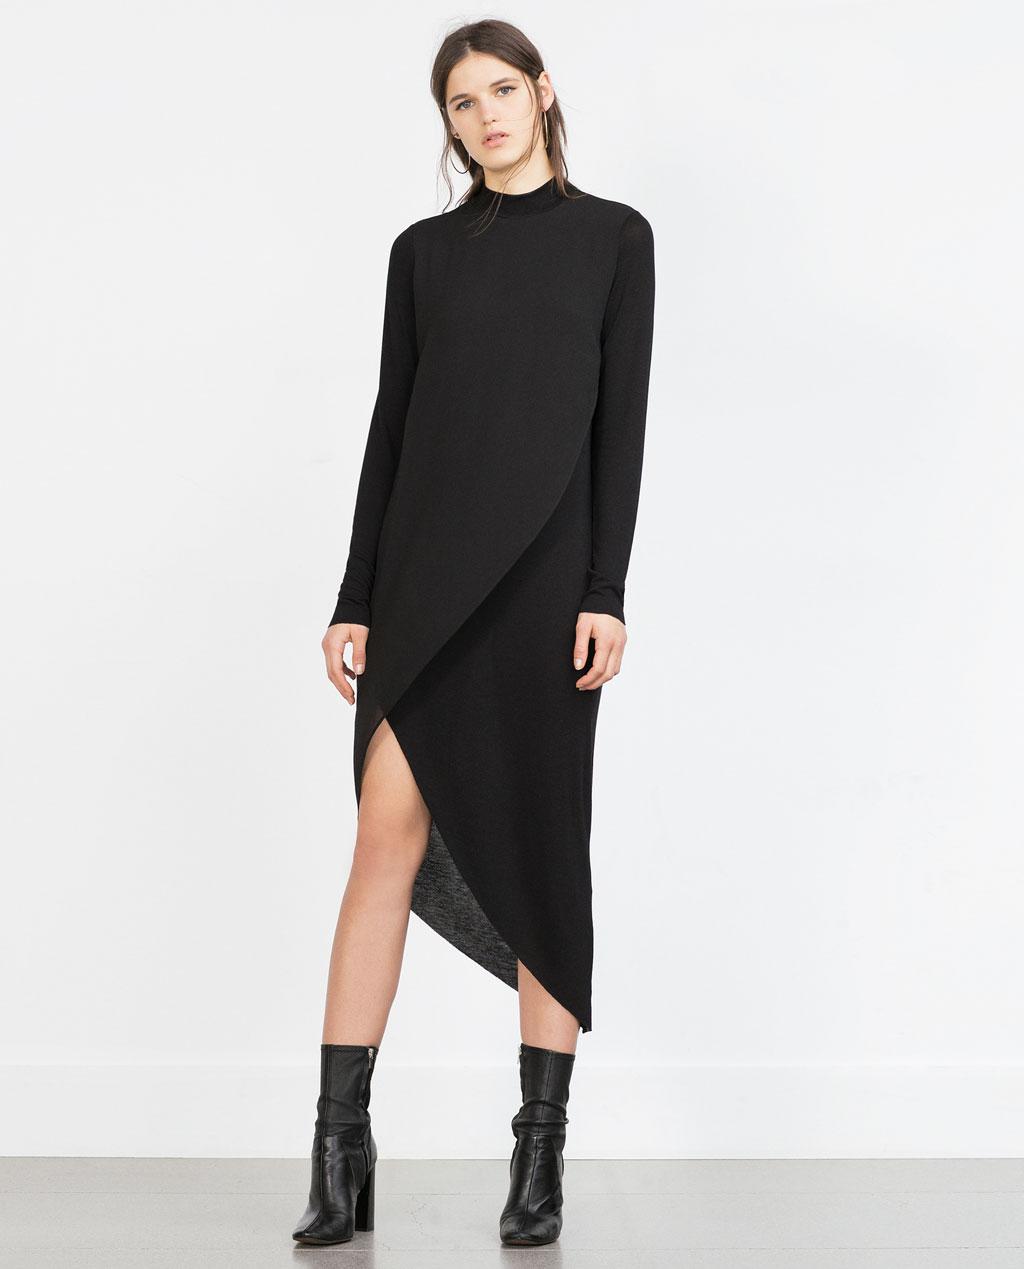 Need Want Now Tuxedo Dress Wool Blend Coat More Kuiya S Kloset